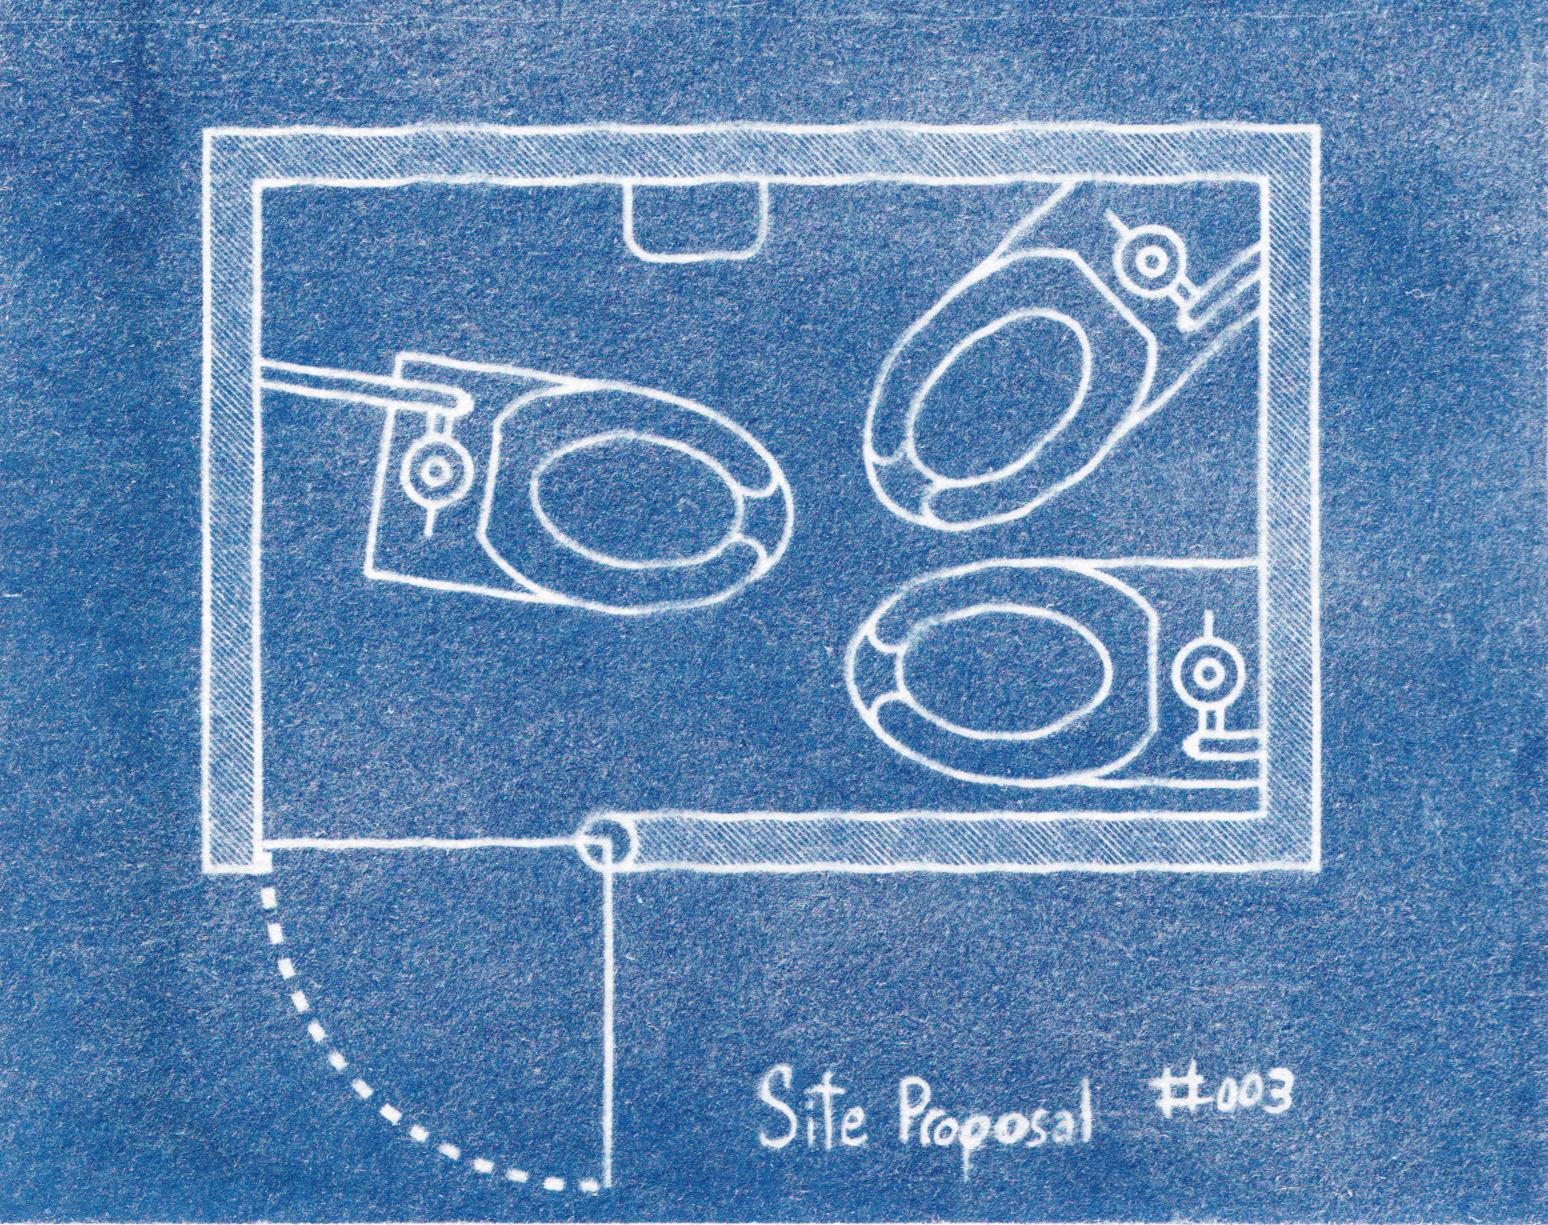 SiteProposal_3.jpg